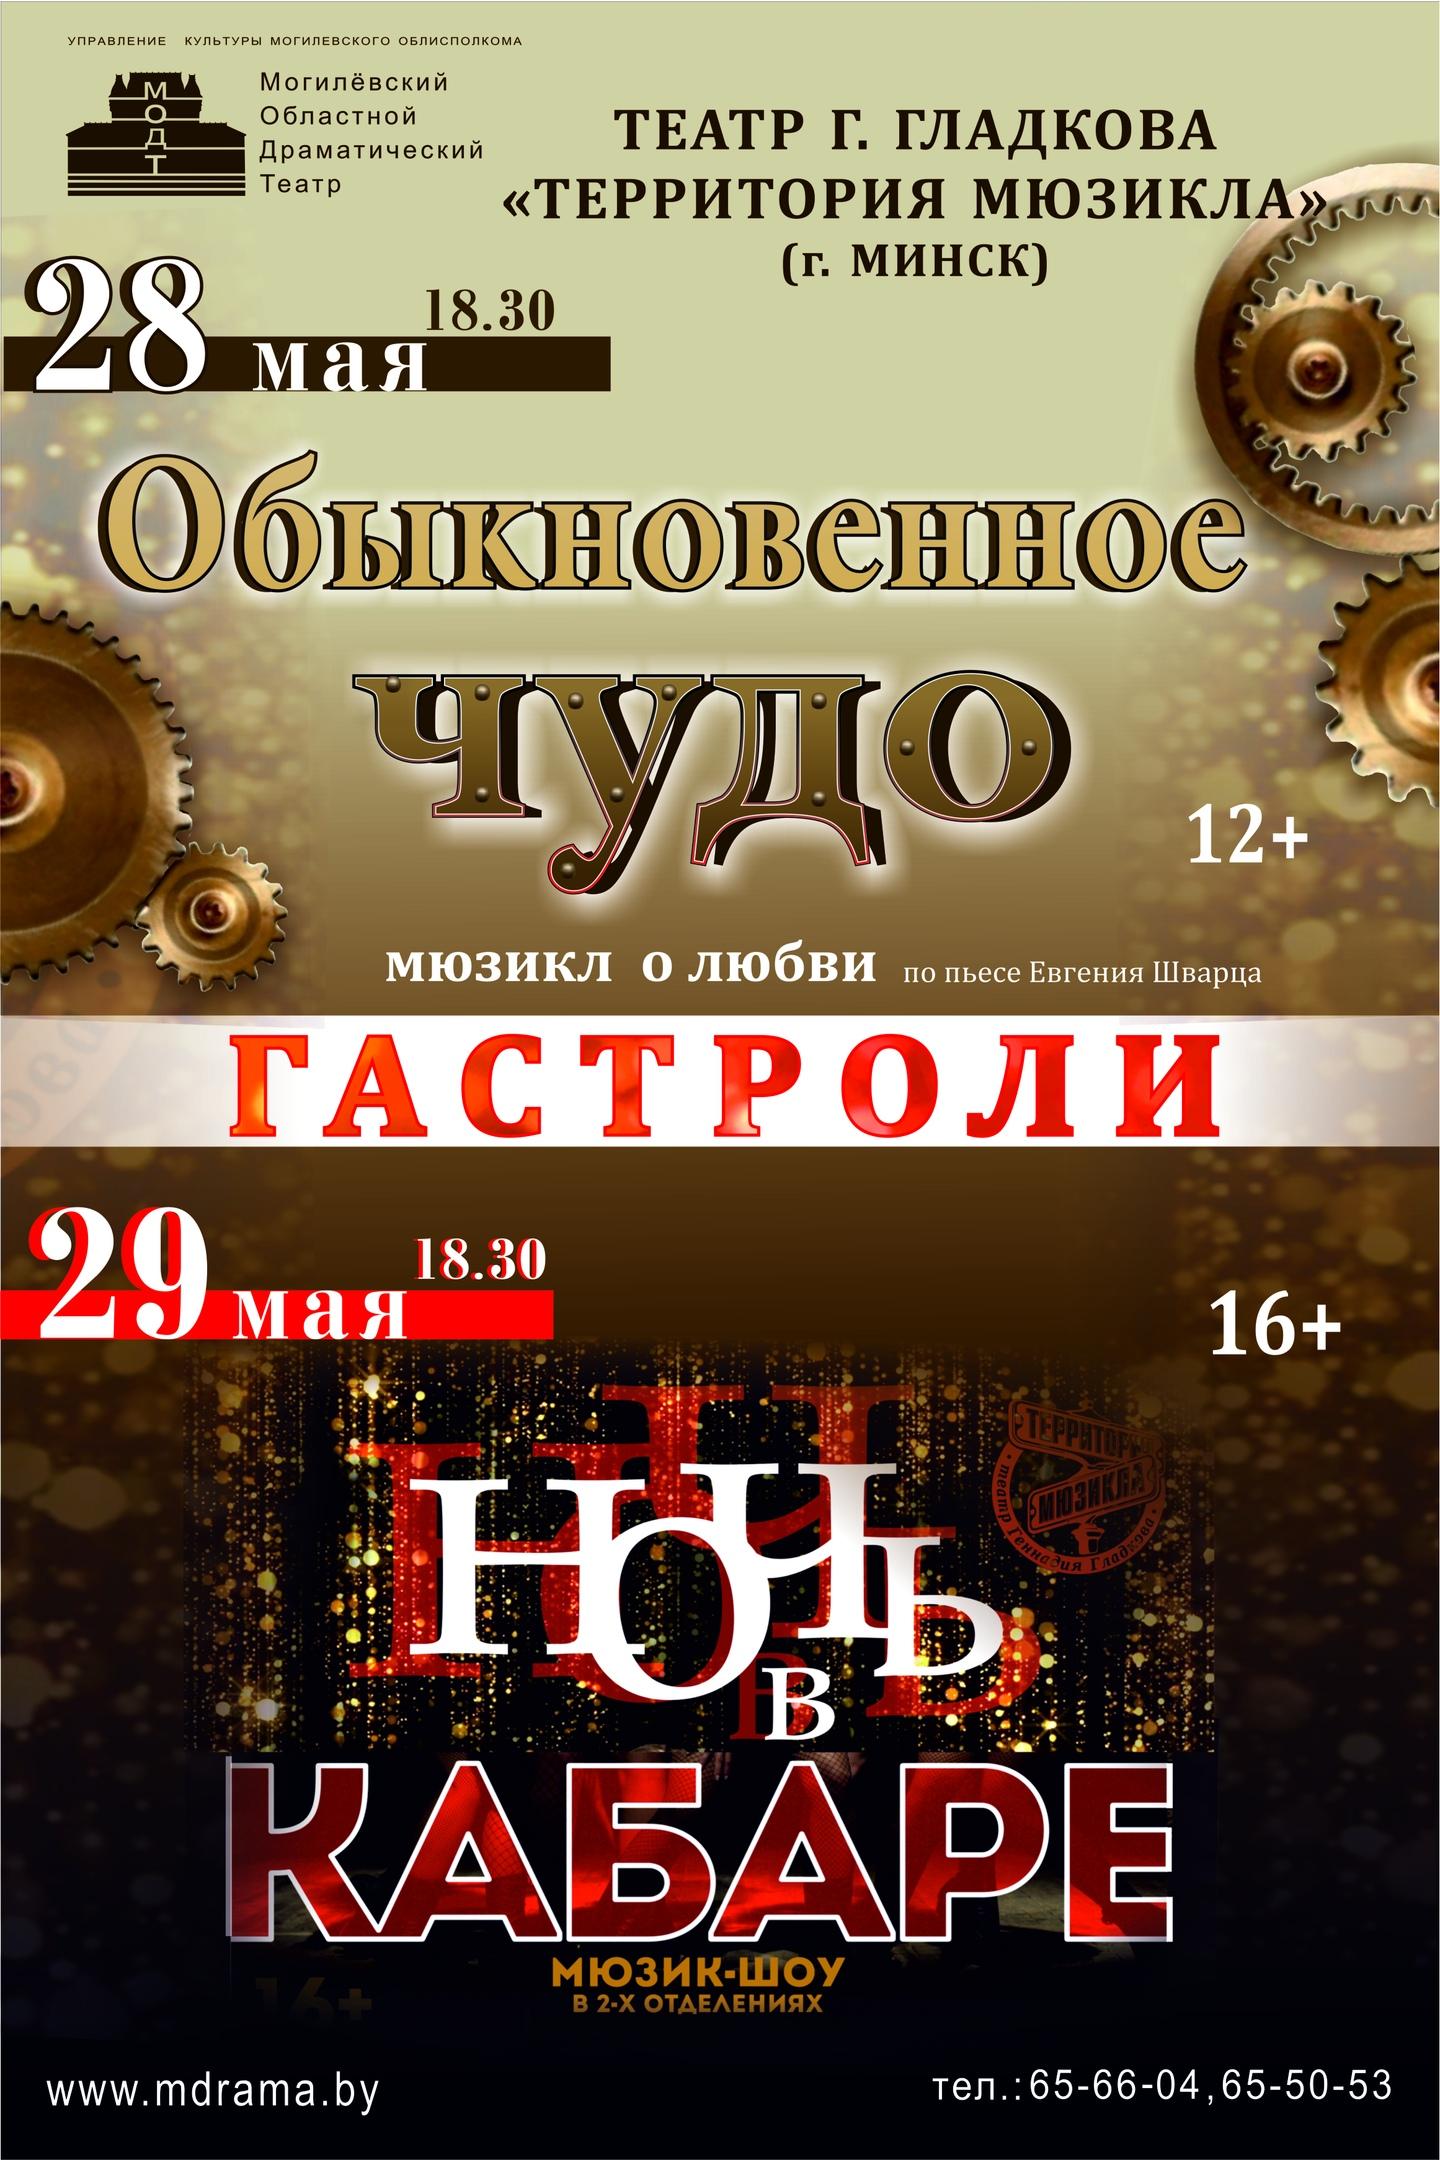 Гастроли Театр ТЕРРИТОРИЯ МЮЗИКЛА